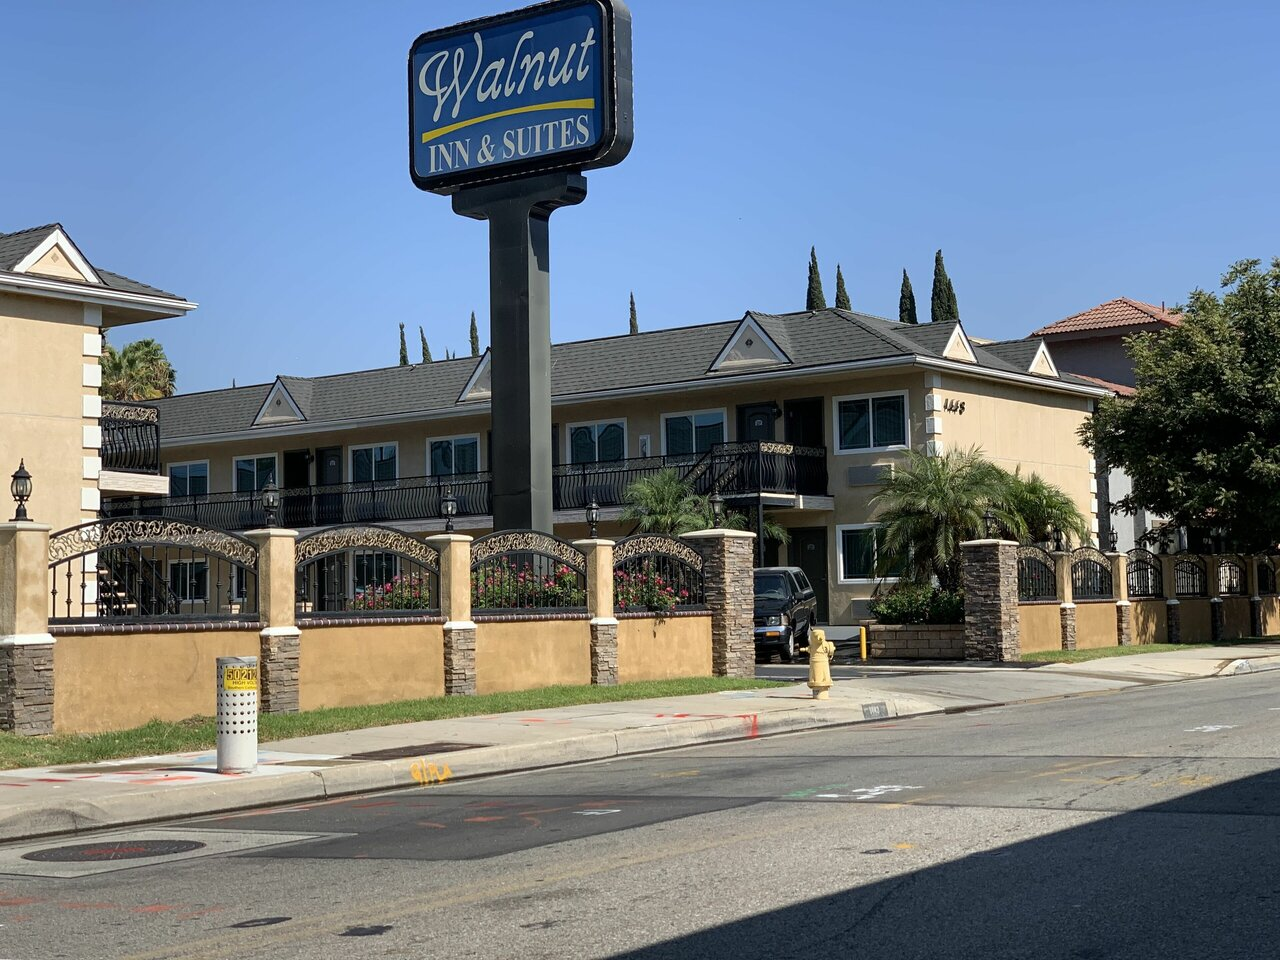 Walnut Inn & Suites